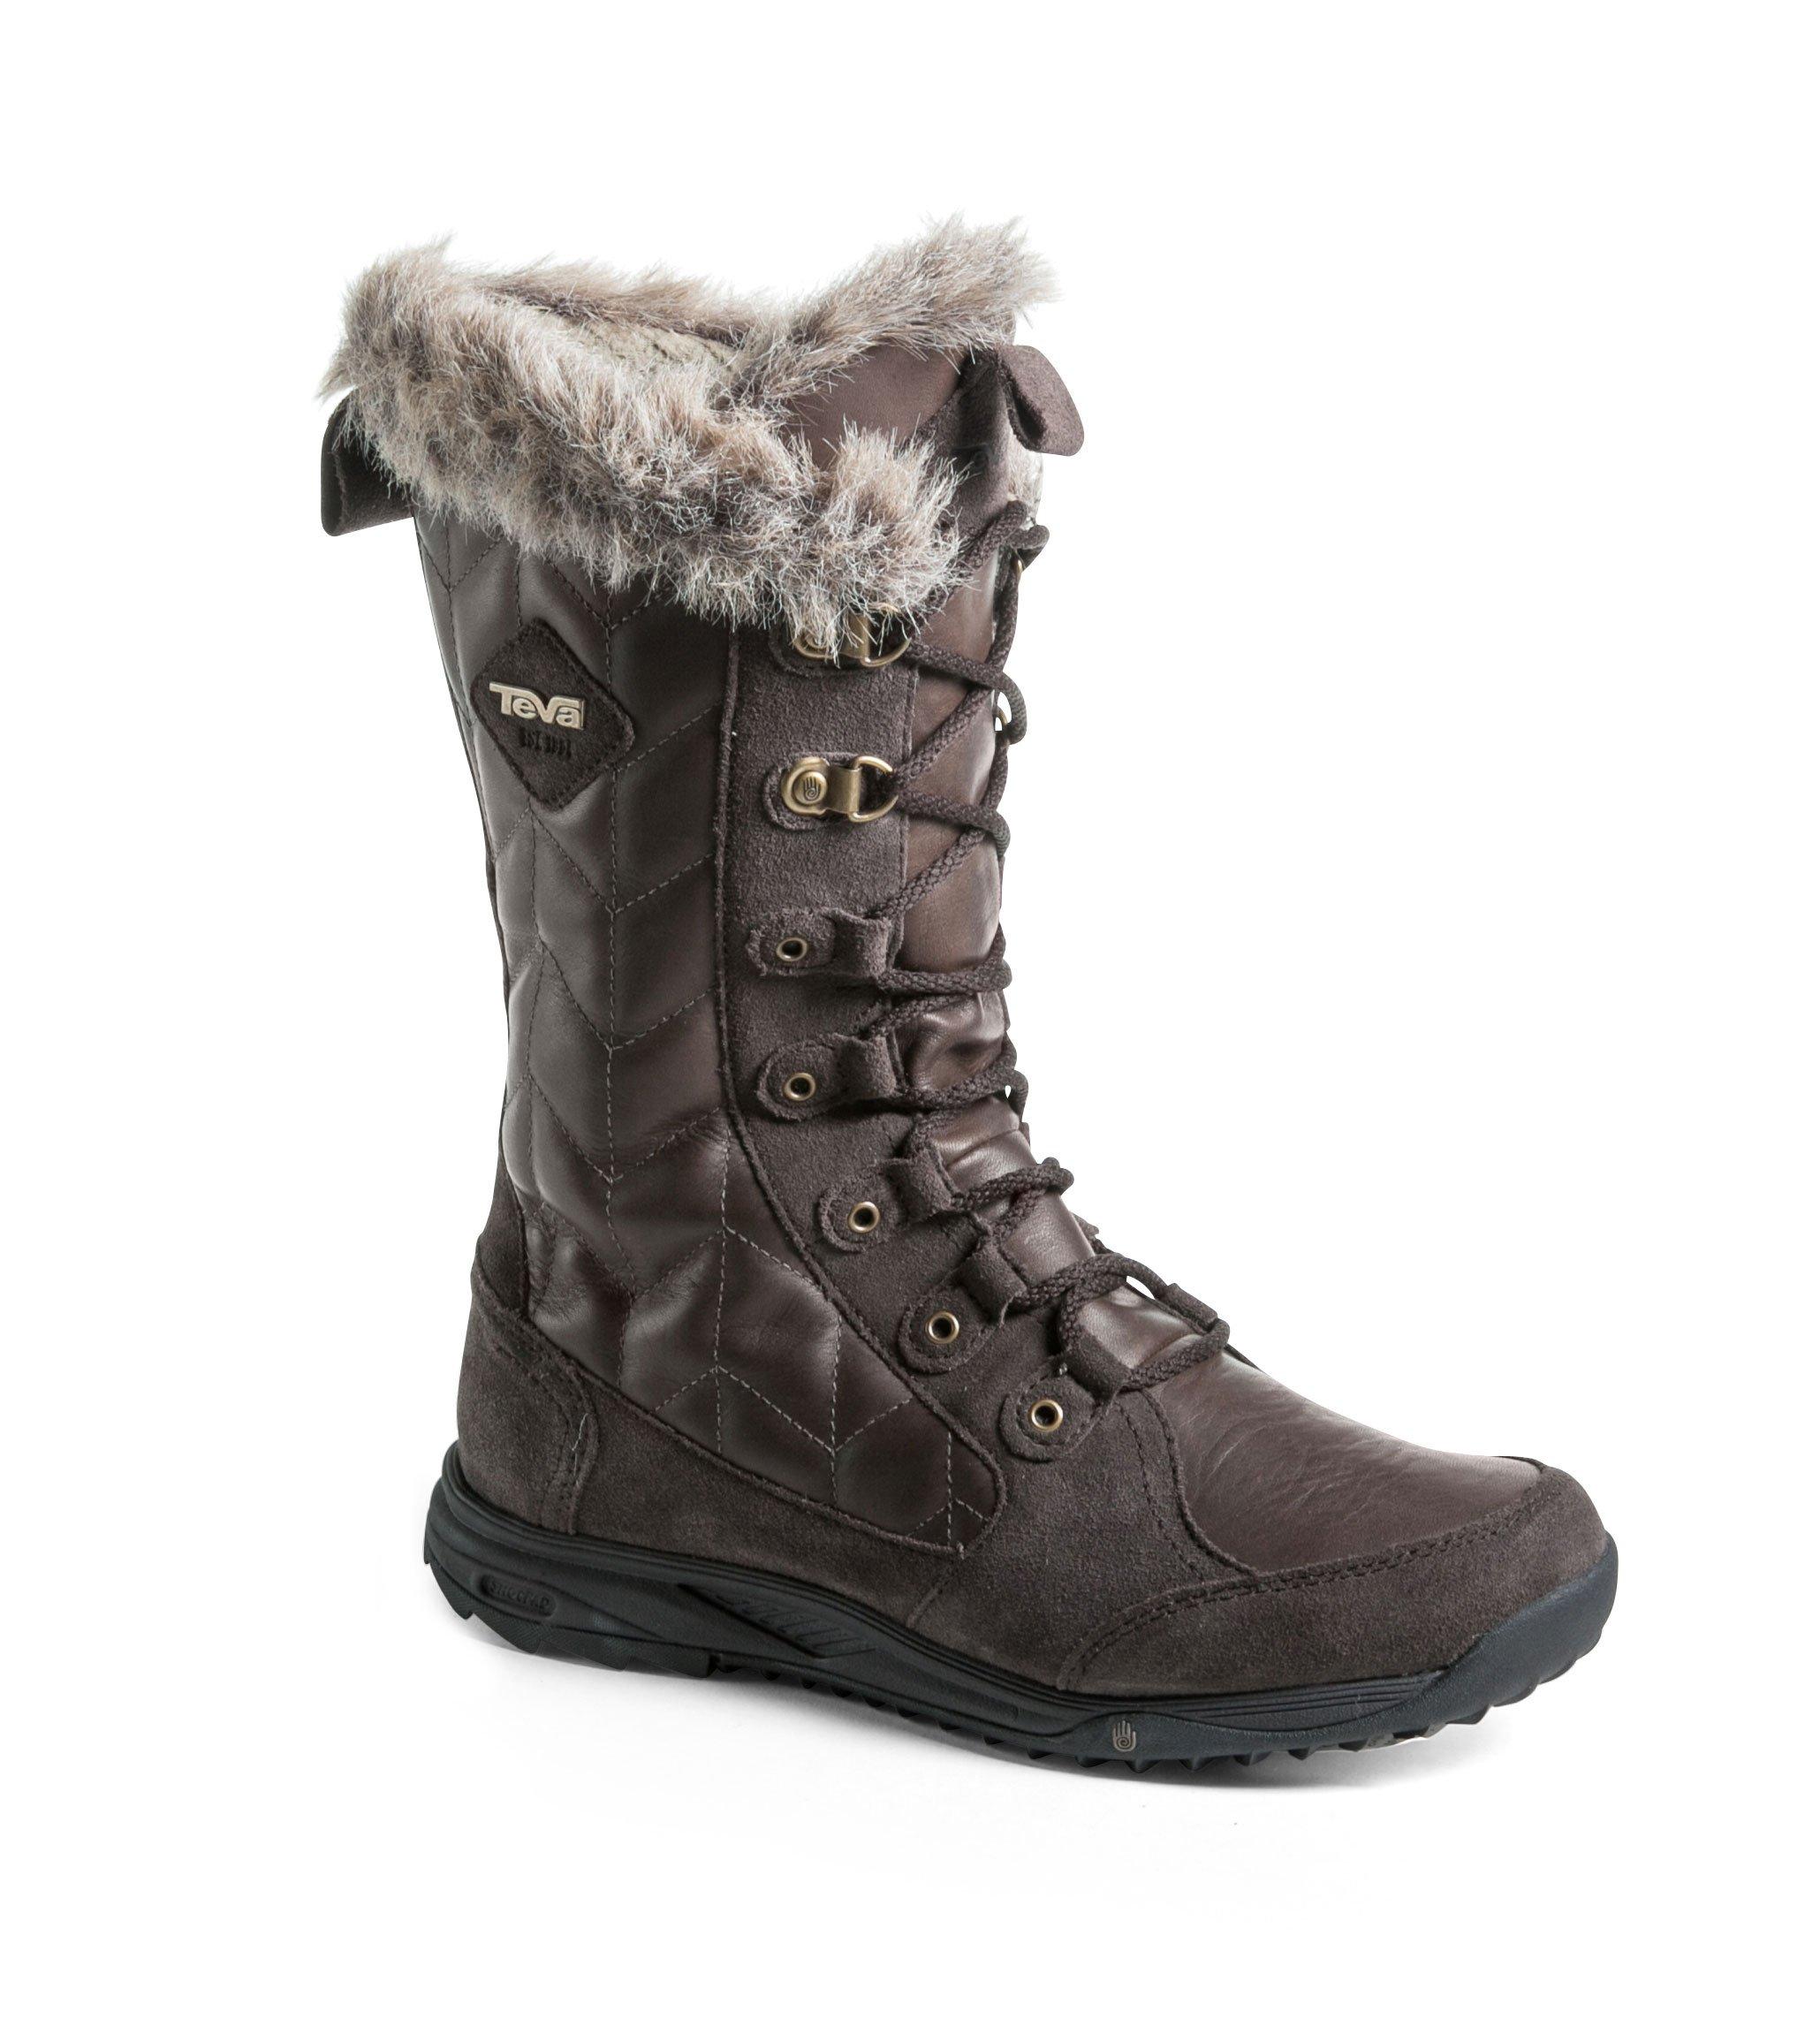 Teva lenawee leather damestøvle fra Teva fra billigsport24